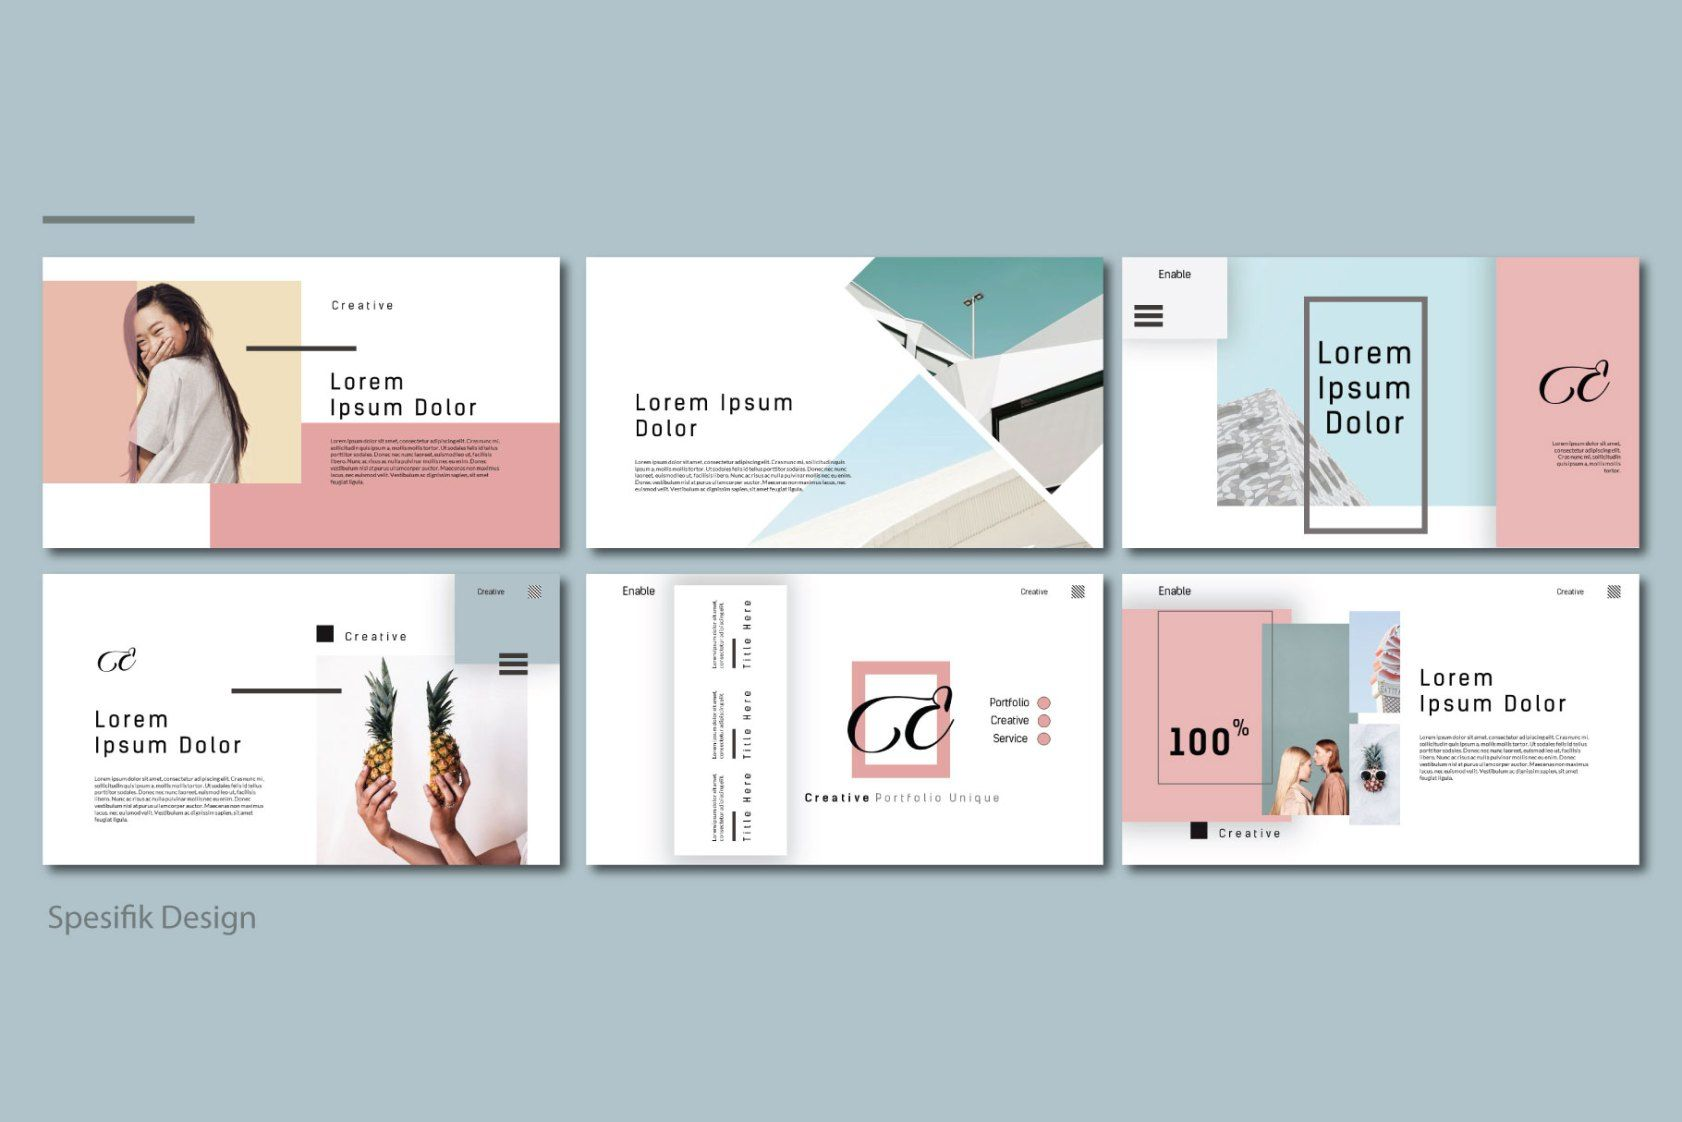 Enable Free Presentation Template การออกแบบปก ด ไซน ปกหน งส อ